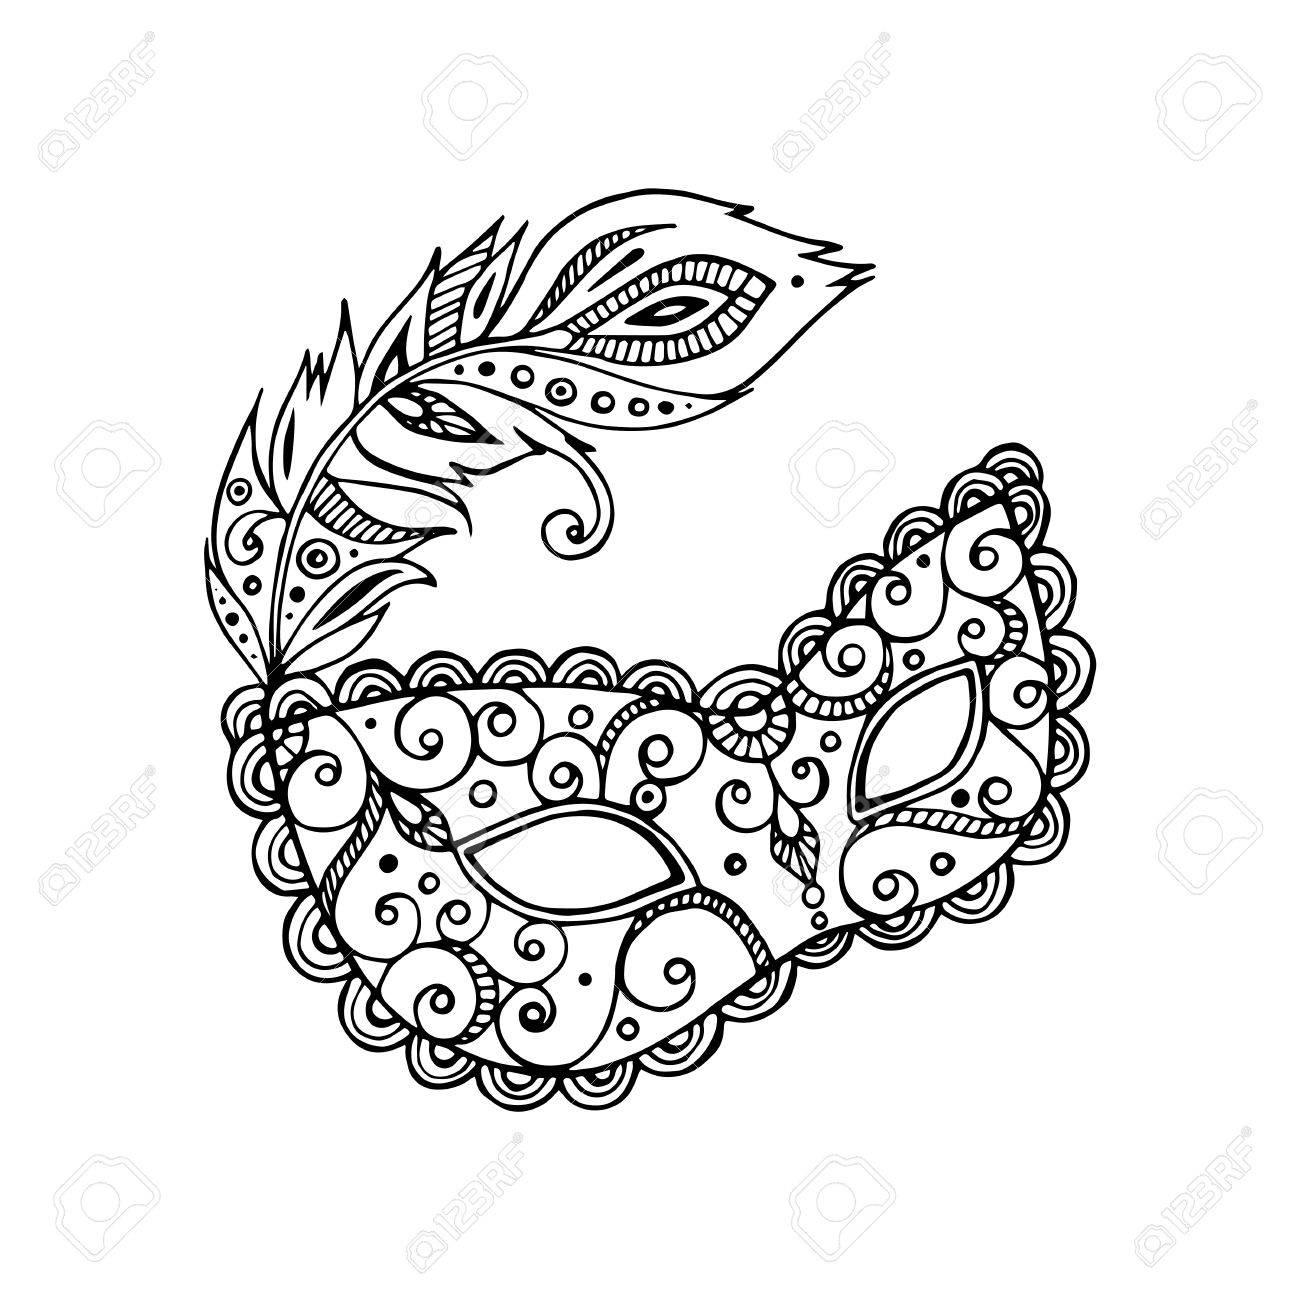 1300x1300 Black Beautiful Ornate Carnival Mardi Gras Mask, Hand Drawn Vector